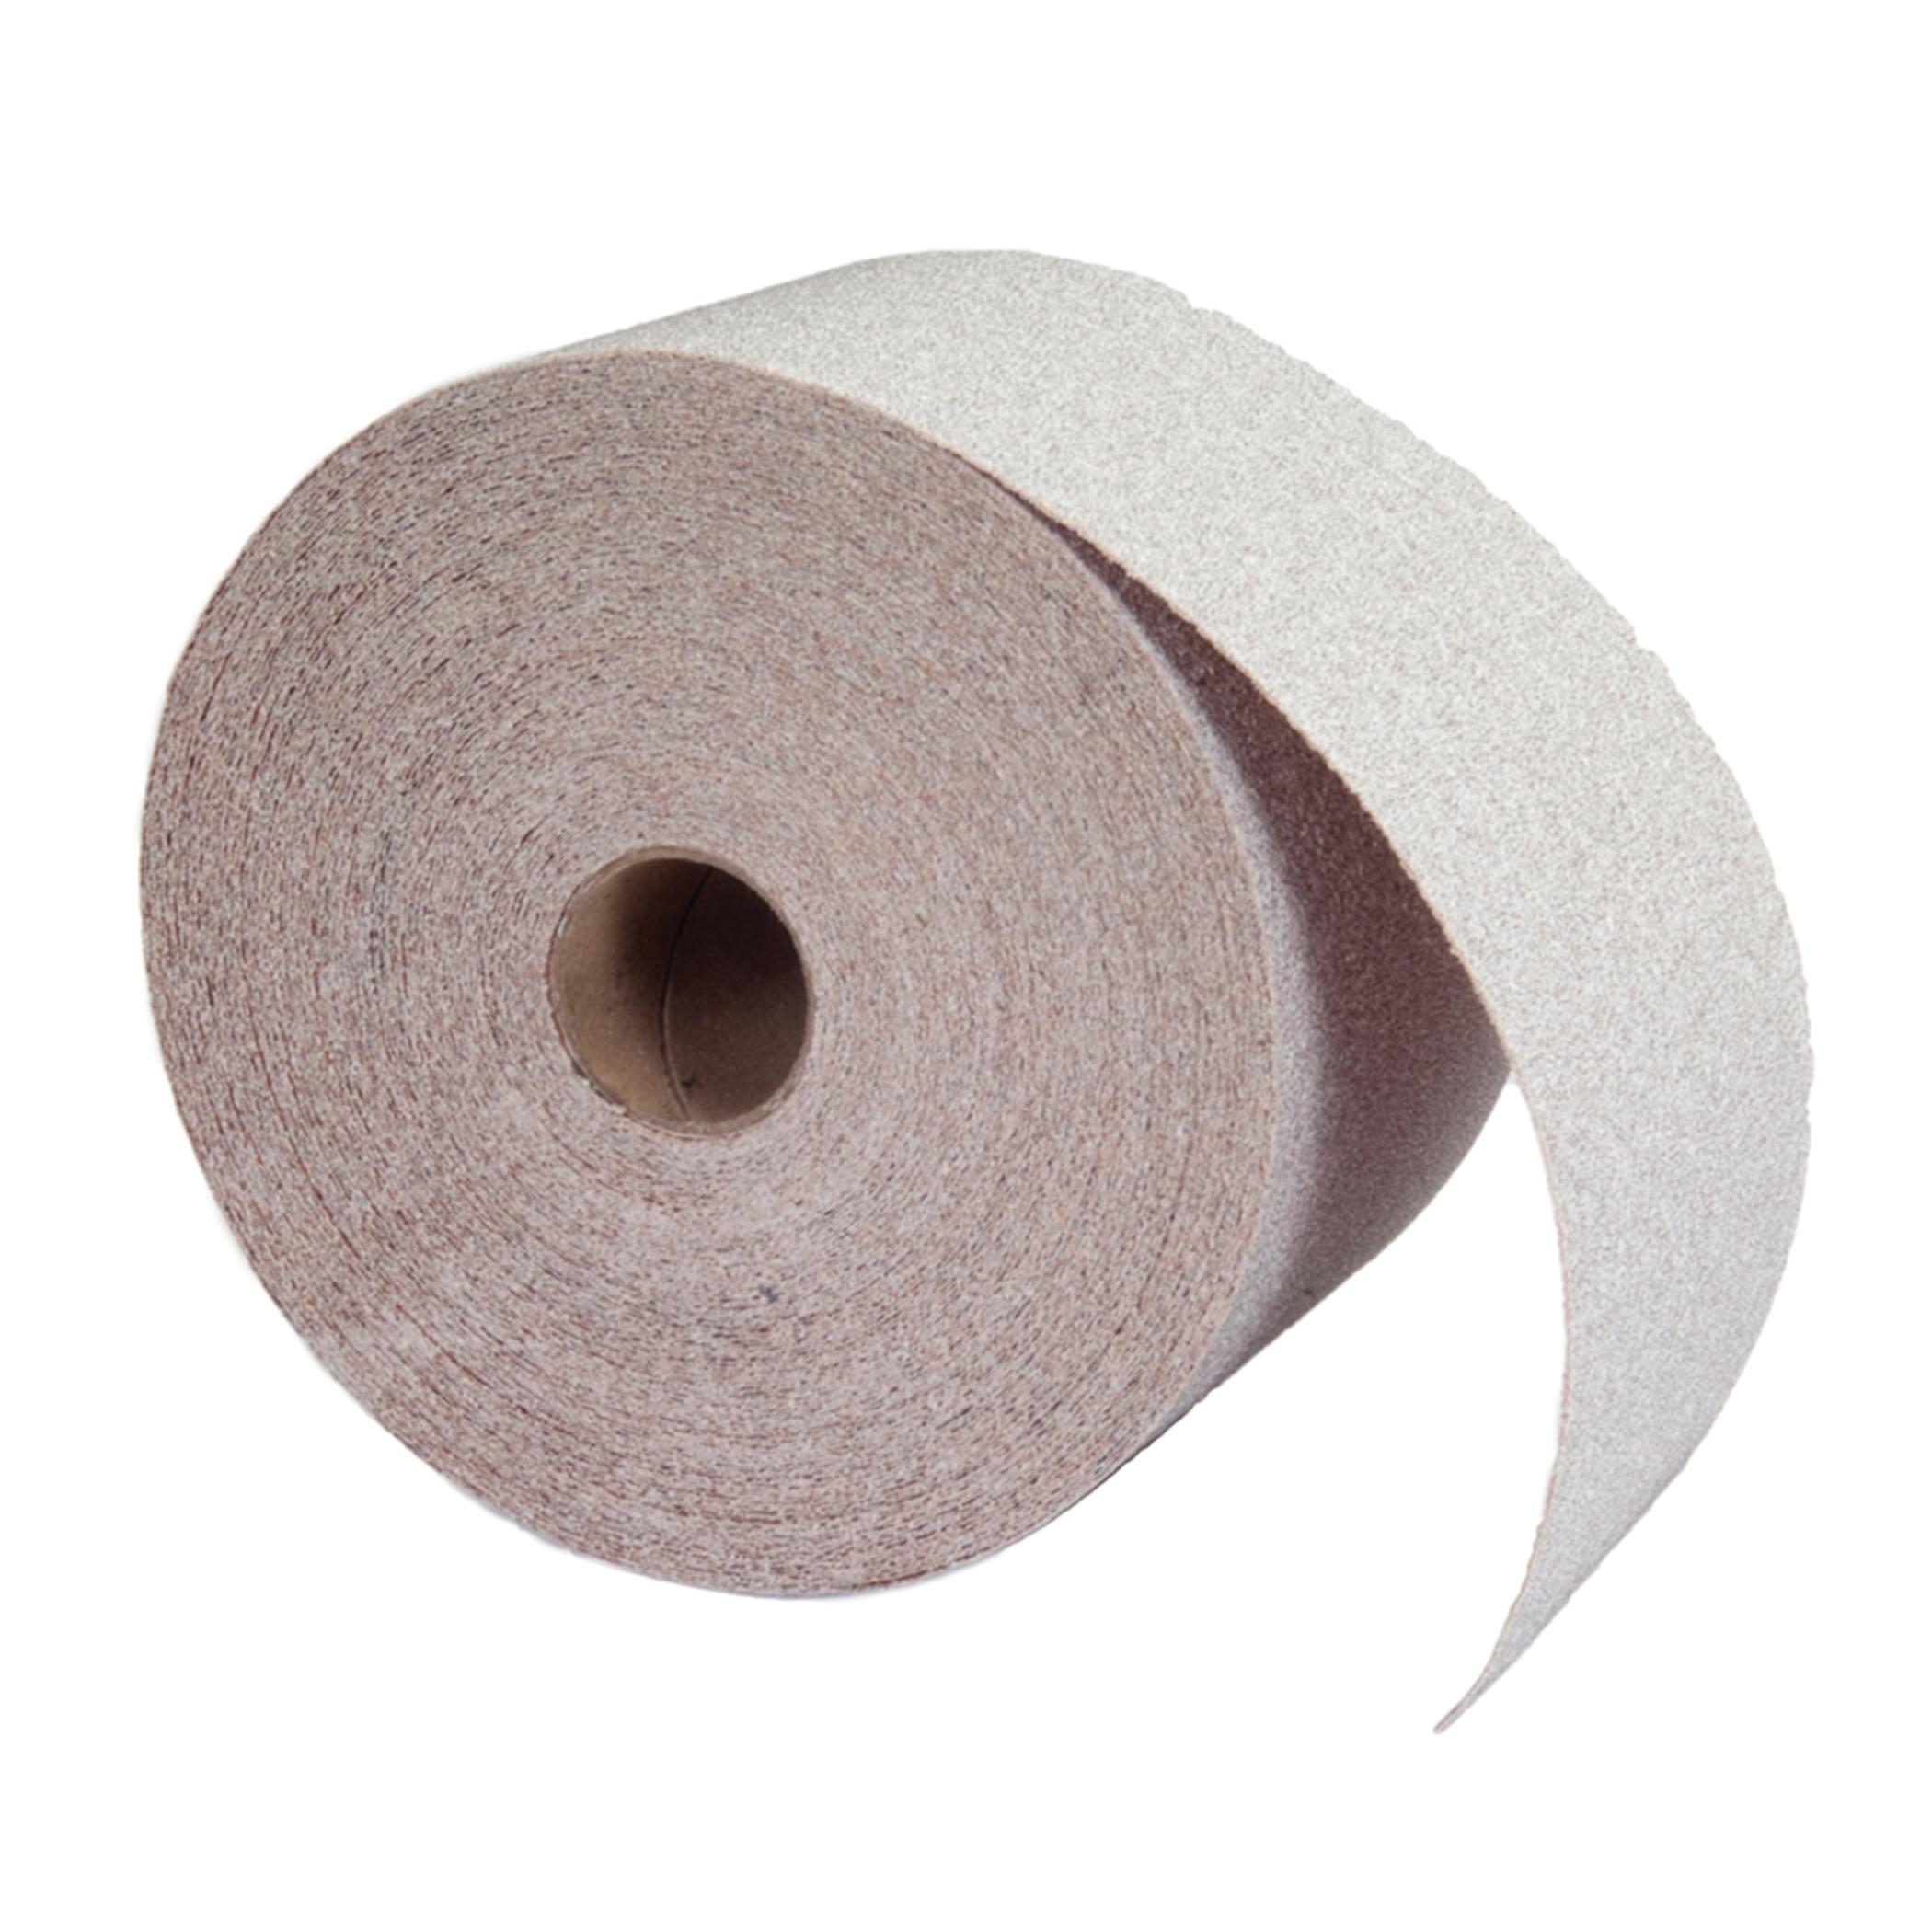 Norton® 66261131688 OP A275 Coated Abrasive Roll, 45 yd L x 2-3/4 in W, 150 Grit, Fine Grade, Aluminum Oxide Abrasive, Anti-Loading Paper Backing